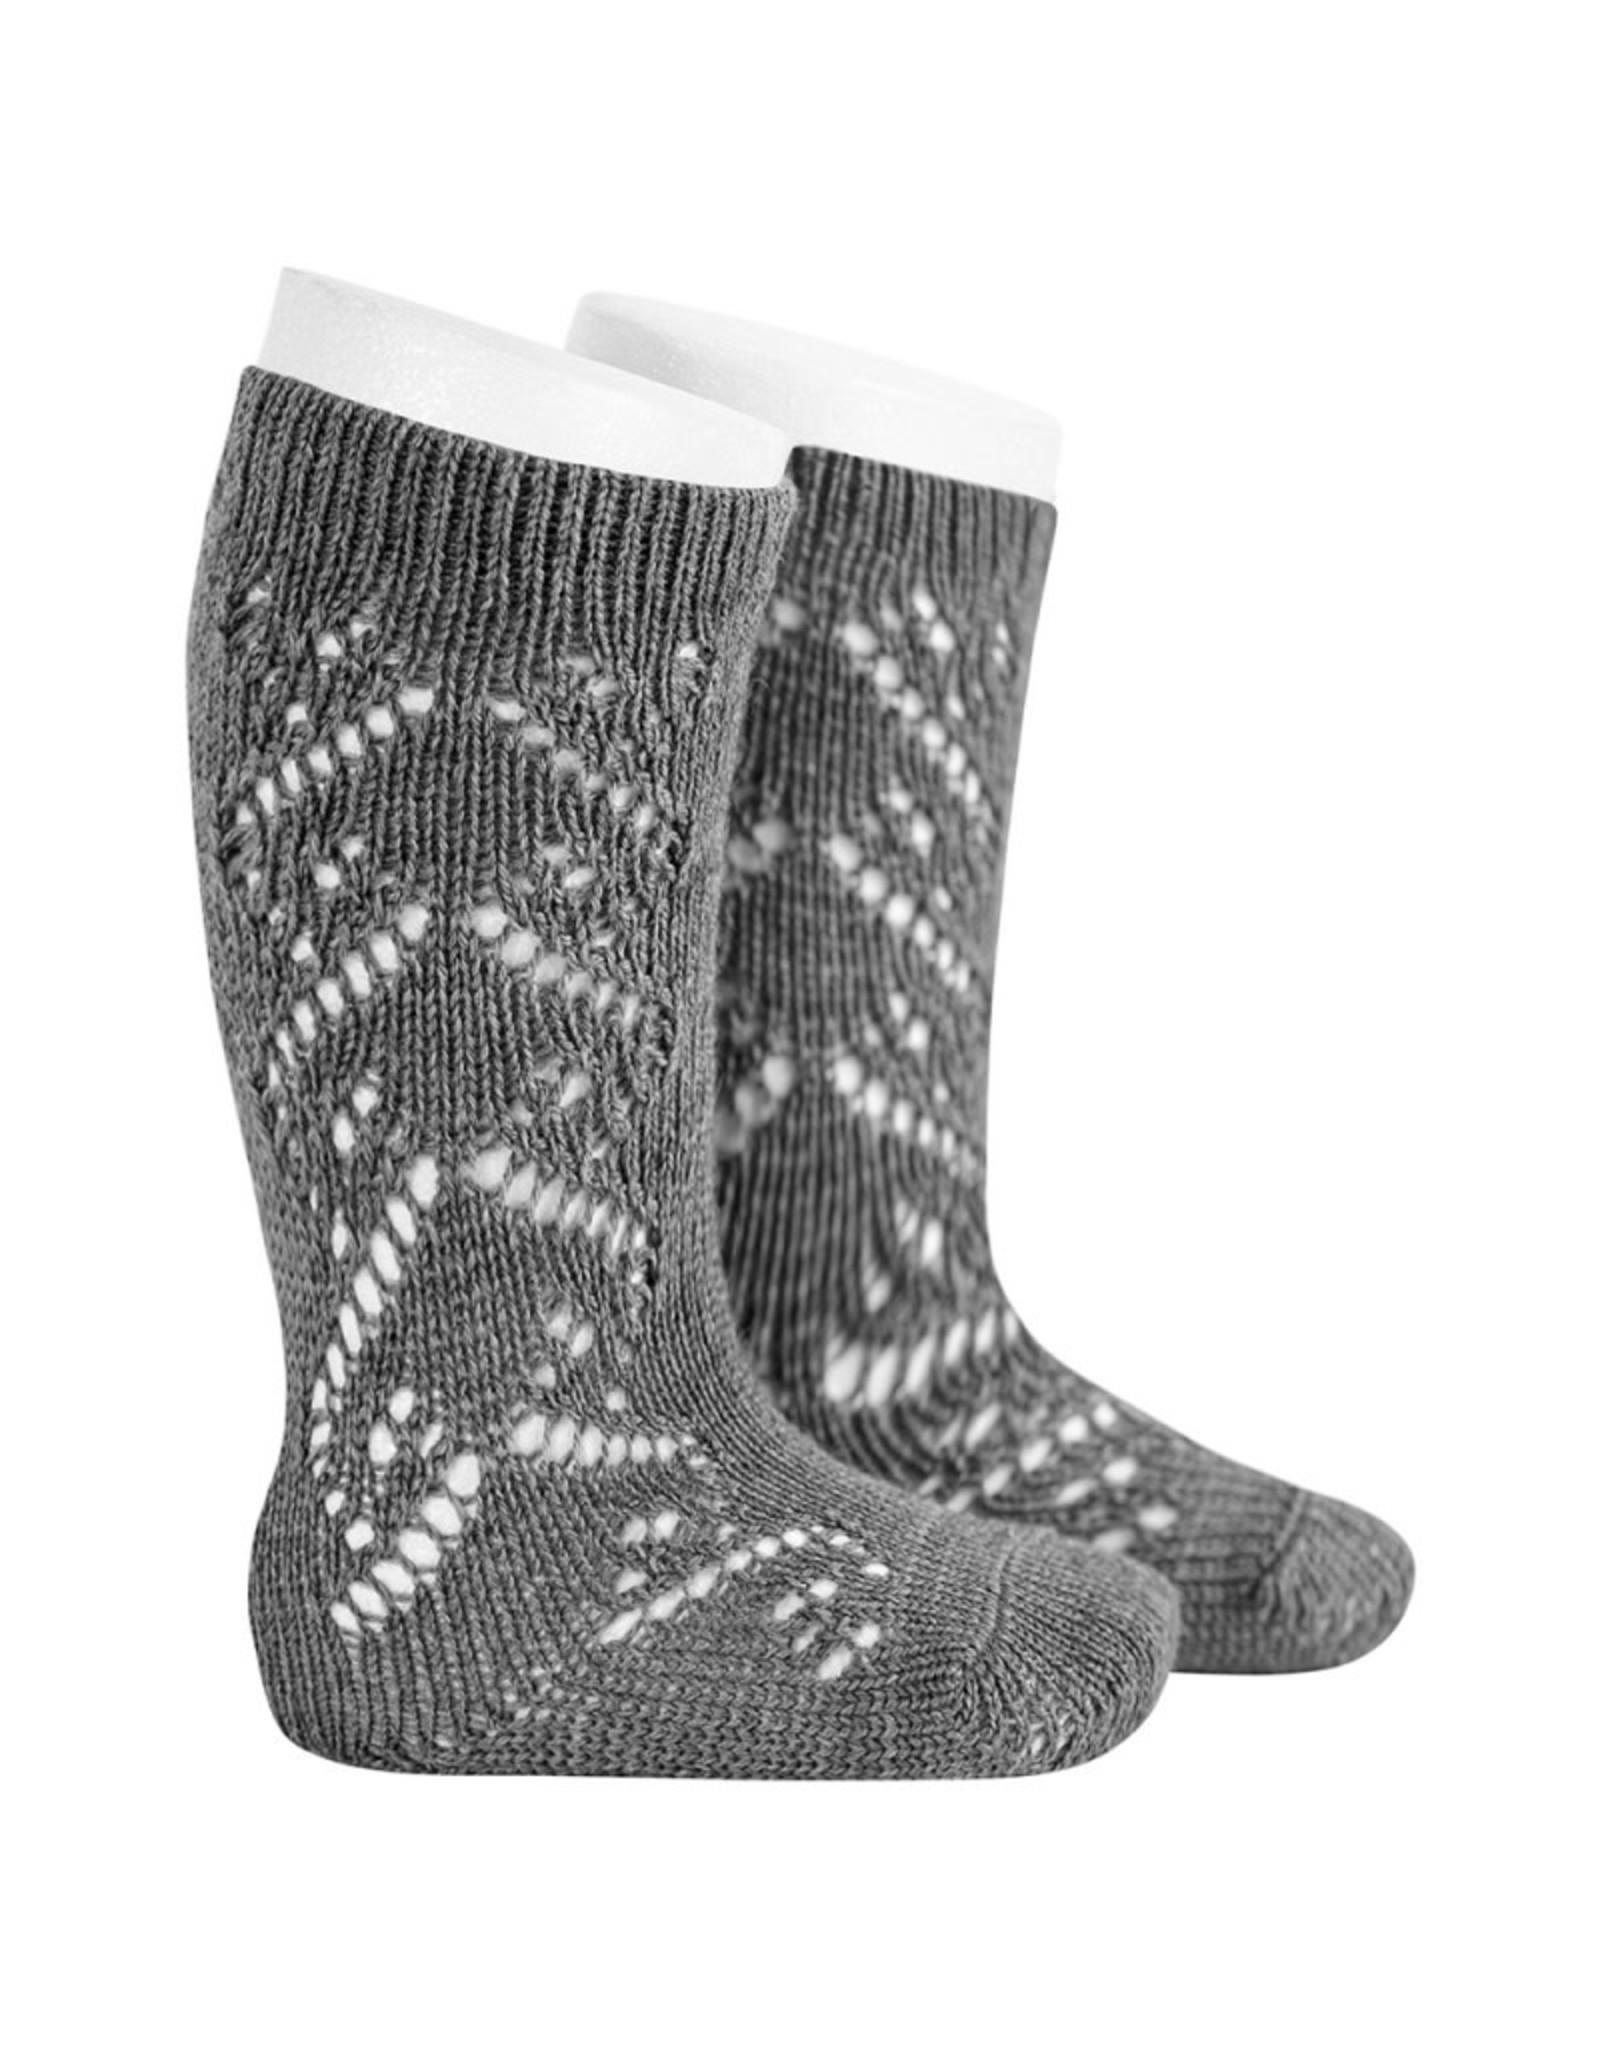 CONDOR Grey Wool Side Openwork Socks